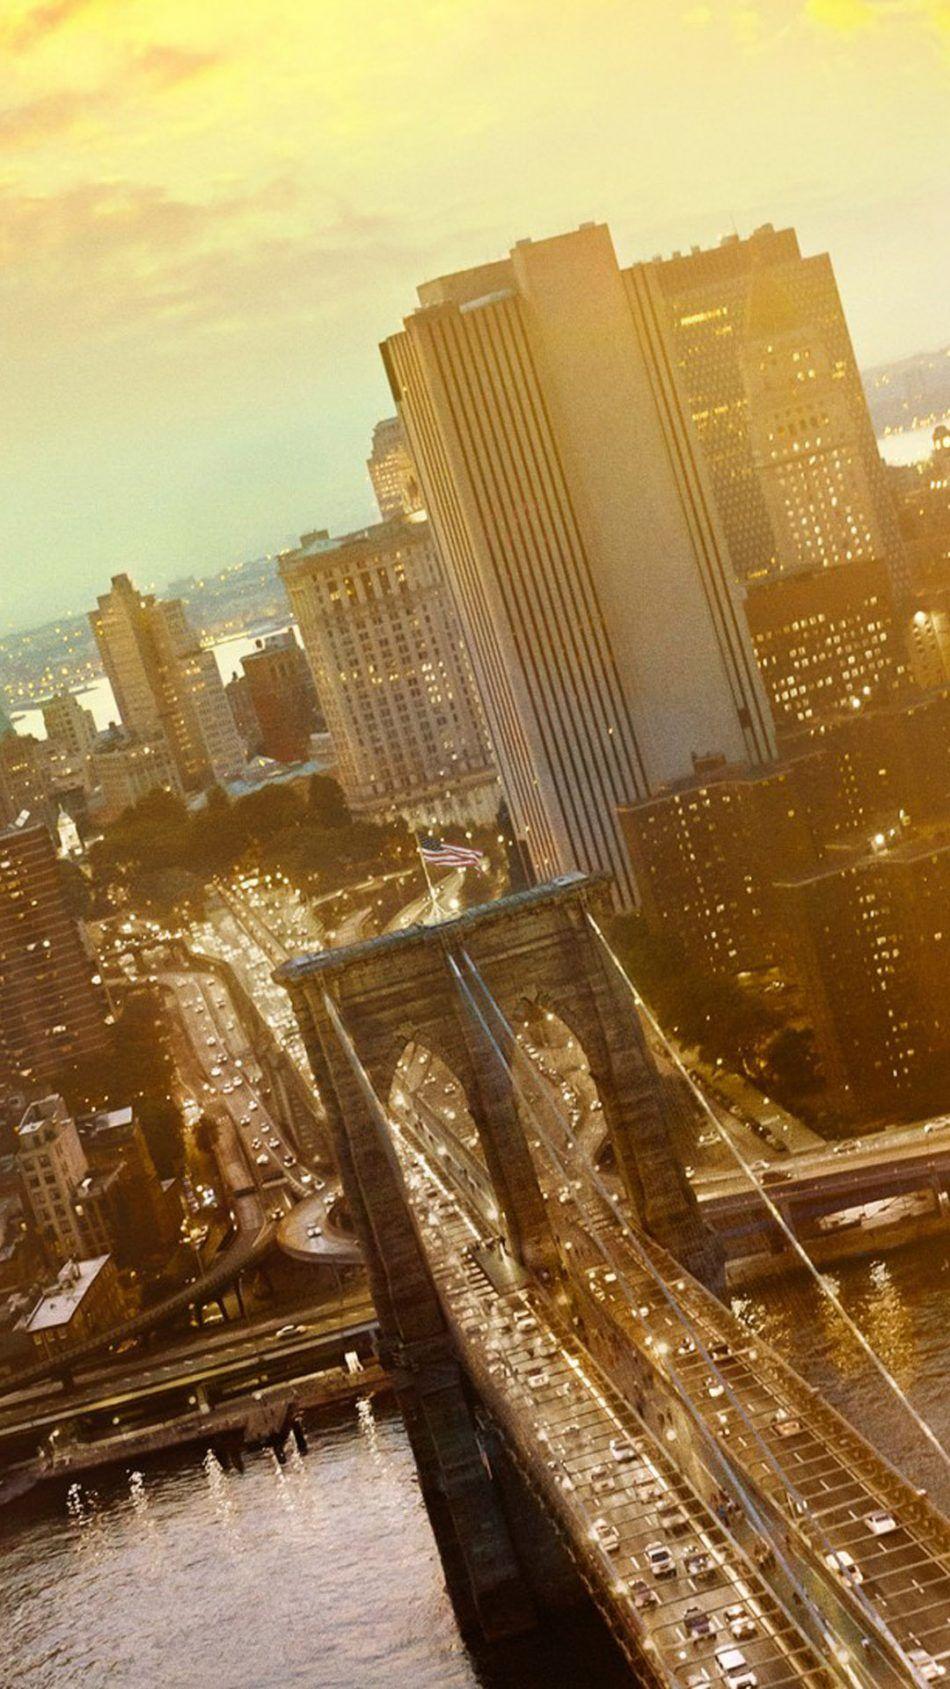 Brooklyn Bridge Cityscape New York City 4k Ultra Hd Mobile Wallpaper New York Wallpaper Brooklyn Bridge Cityscape